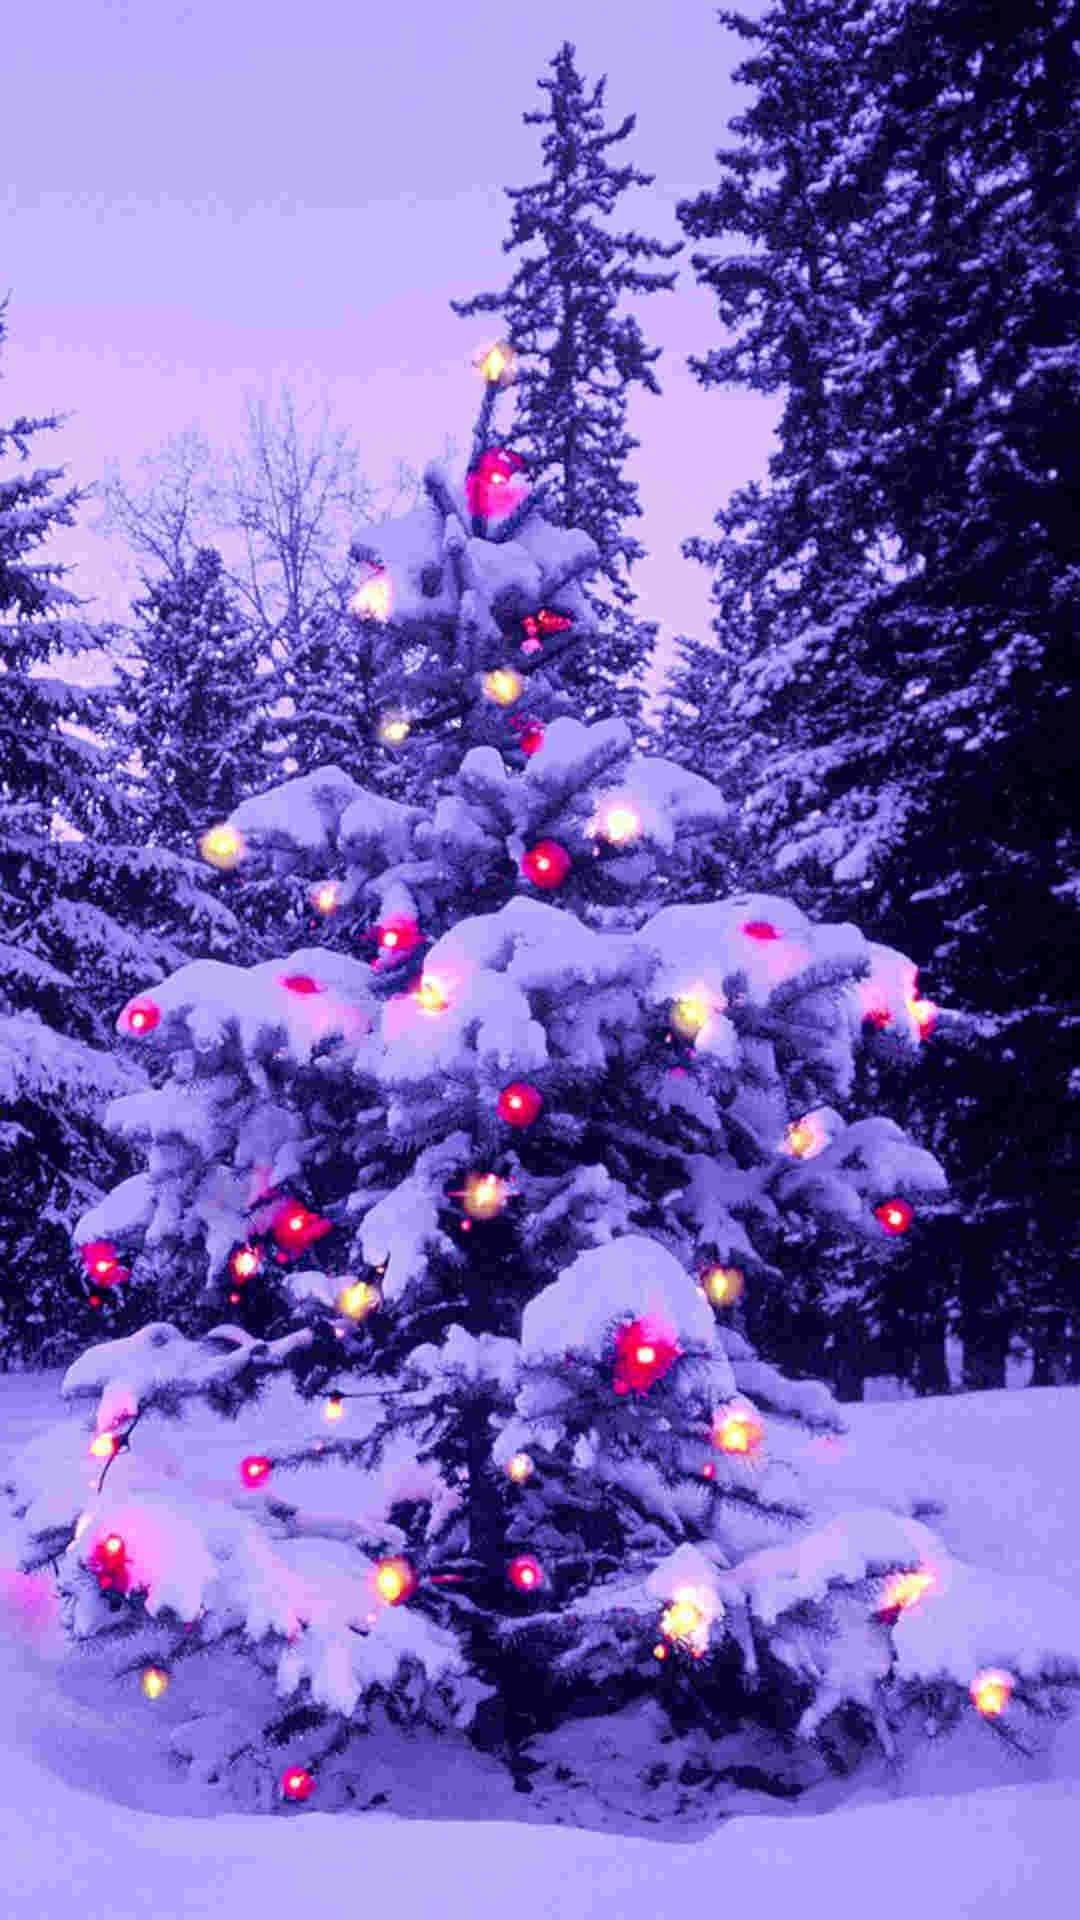 pink light 2014 Christmas tree iPhone 6 plus wallpaper – nature #2014 # Christmas #